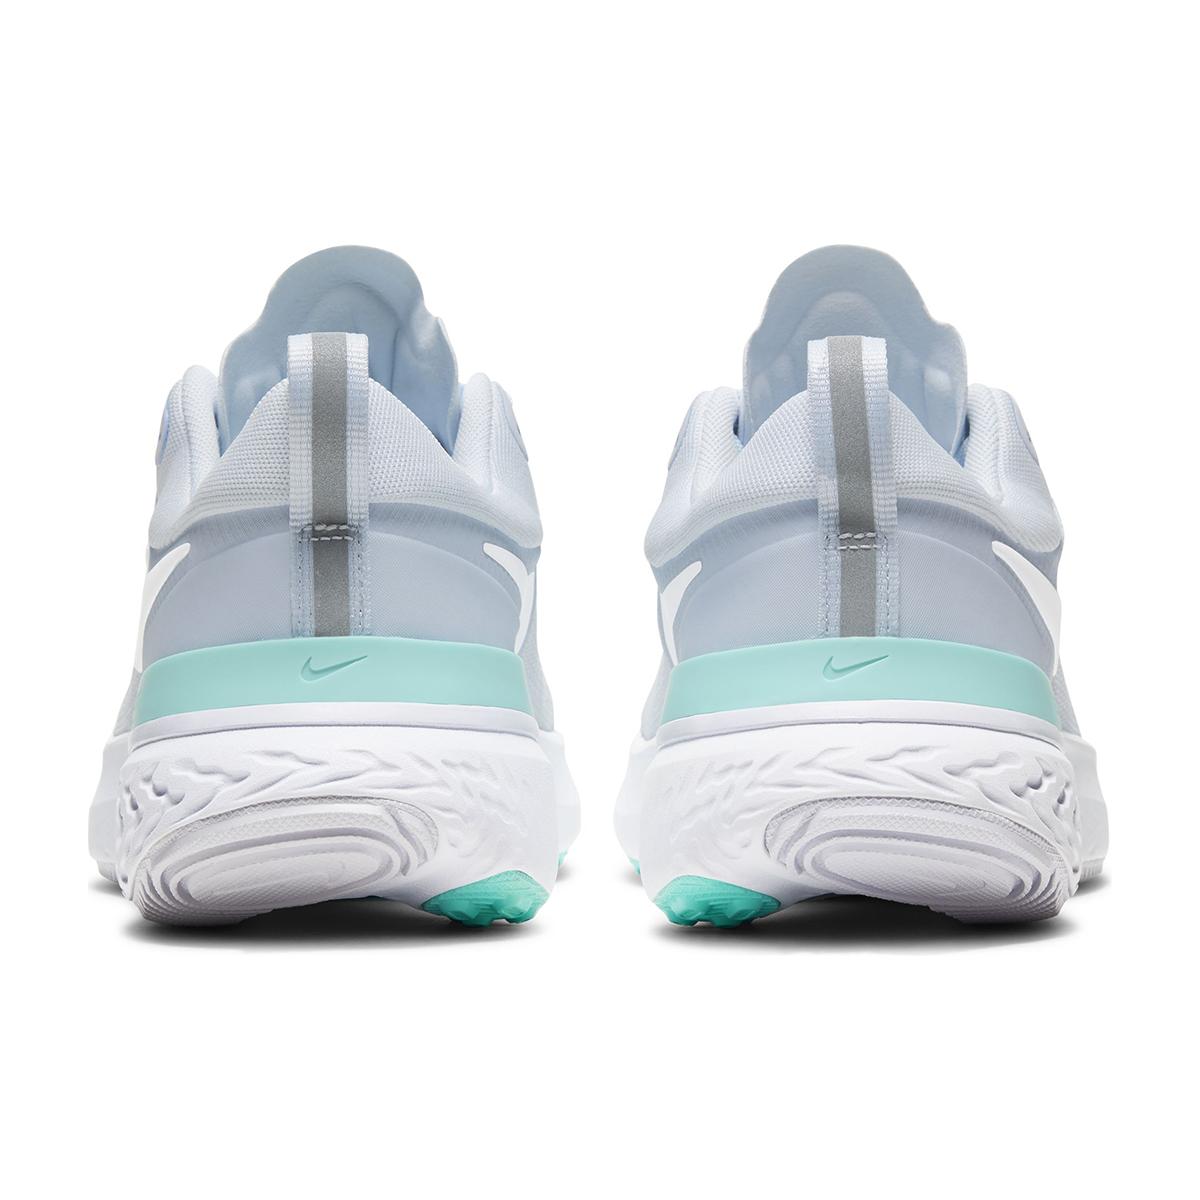 Women's Nike React Miler Running Shoe - Color: Football Grey/Aurora Green/White (Regular Width) - Size: 5.5, Football Grey/Aurora Green/White, large, image 3